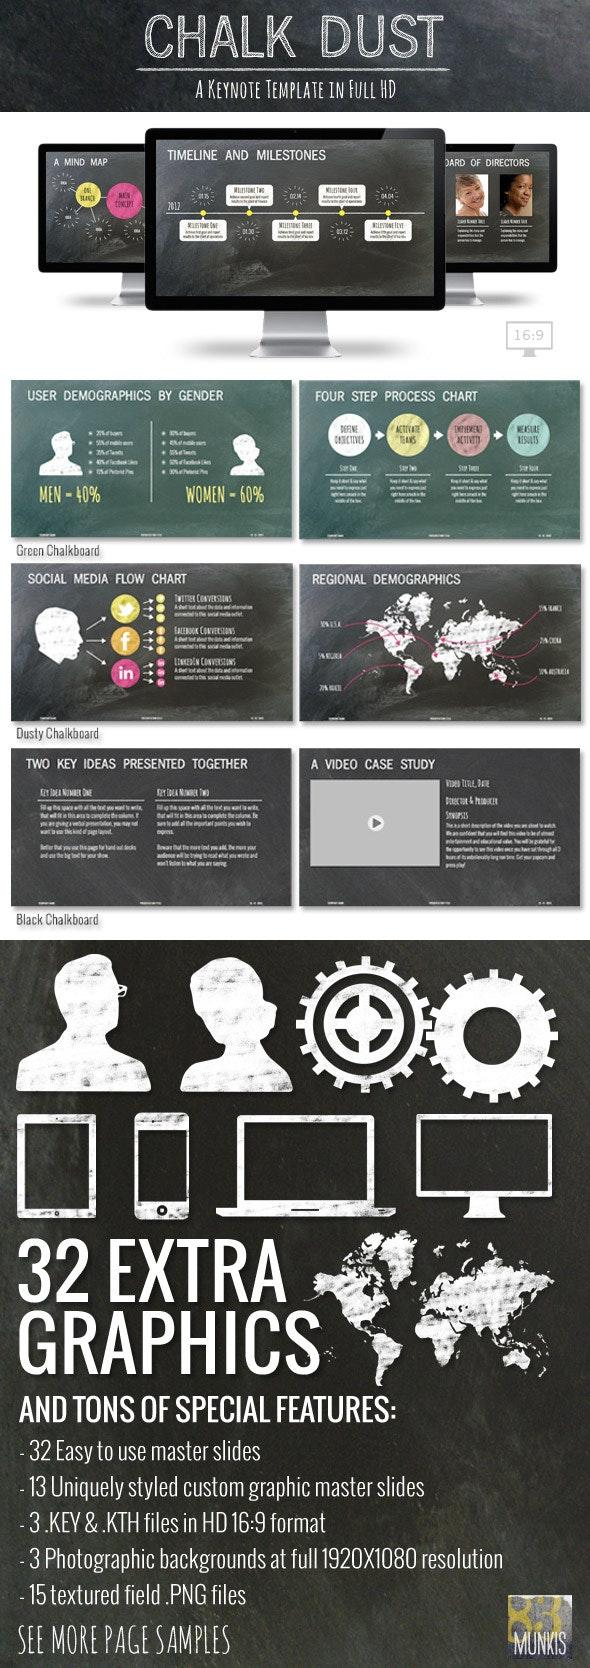 Chalk Dust Keynote Presentation Template - Creative Keynote Templates